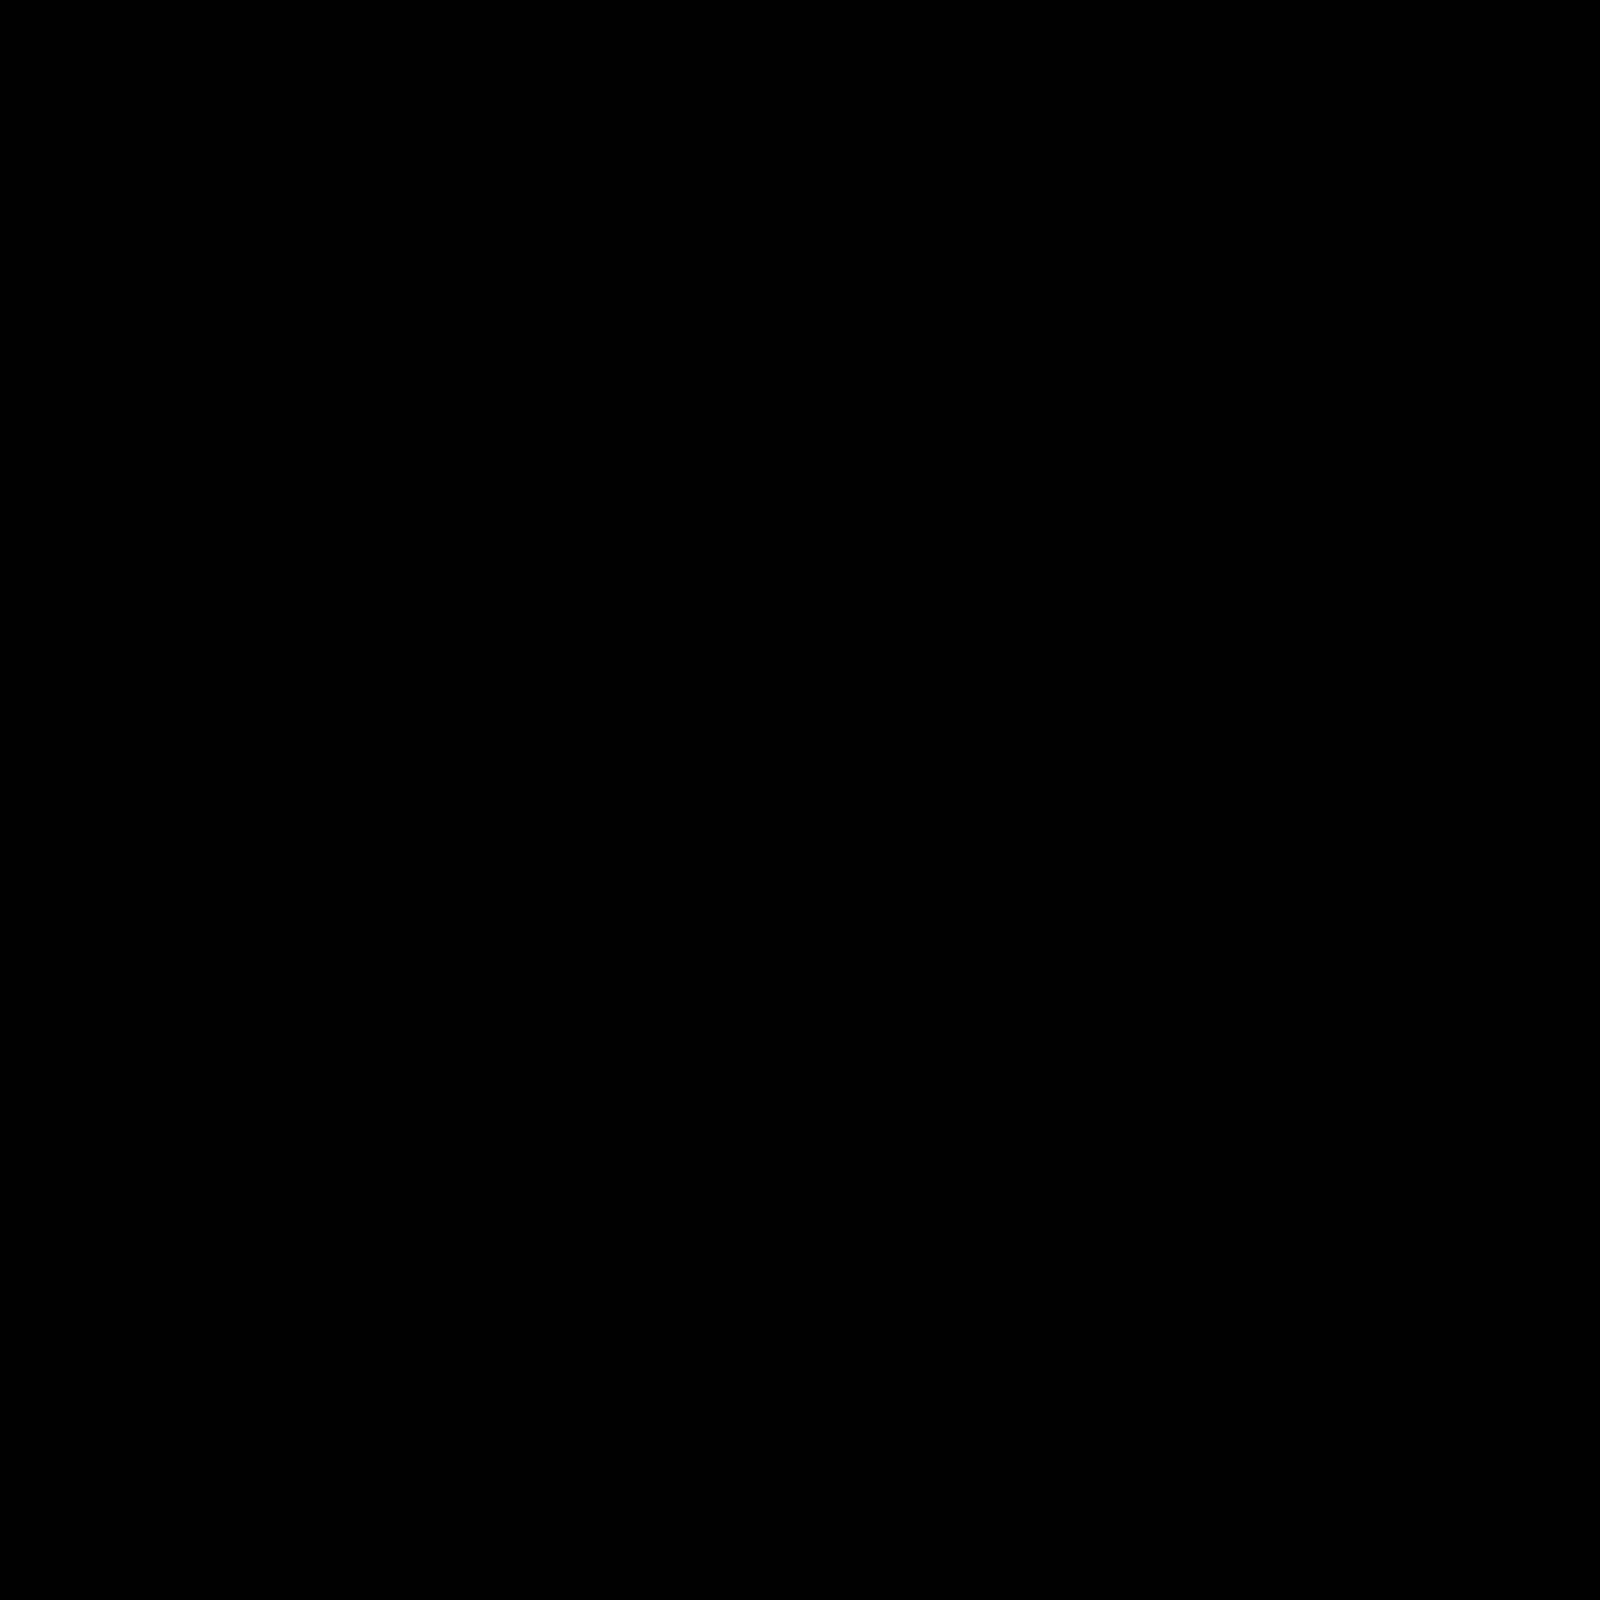 Blender Filled icon